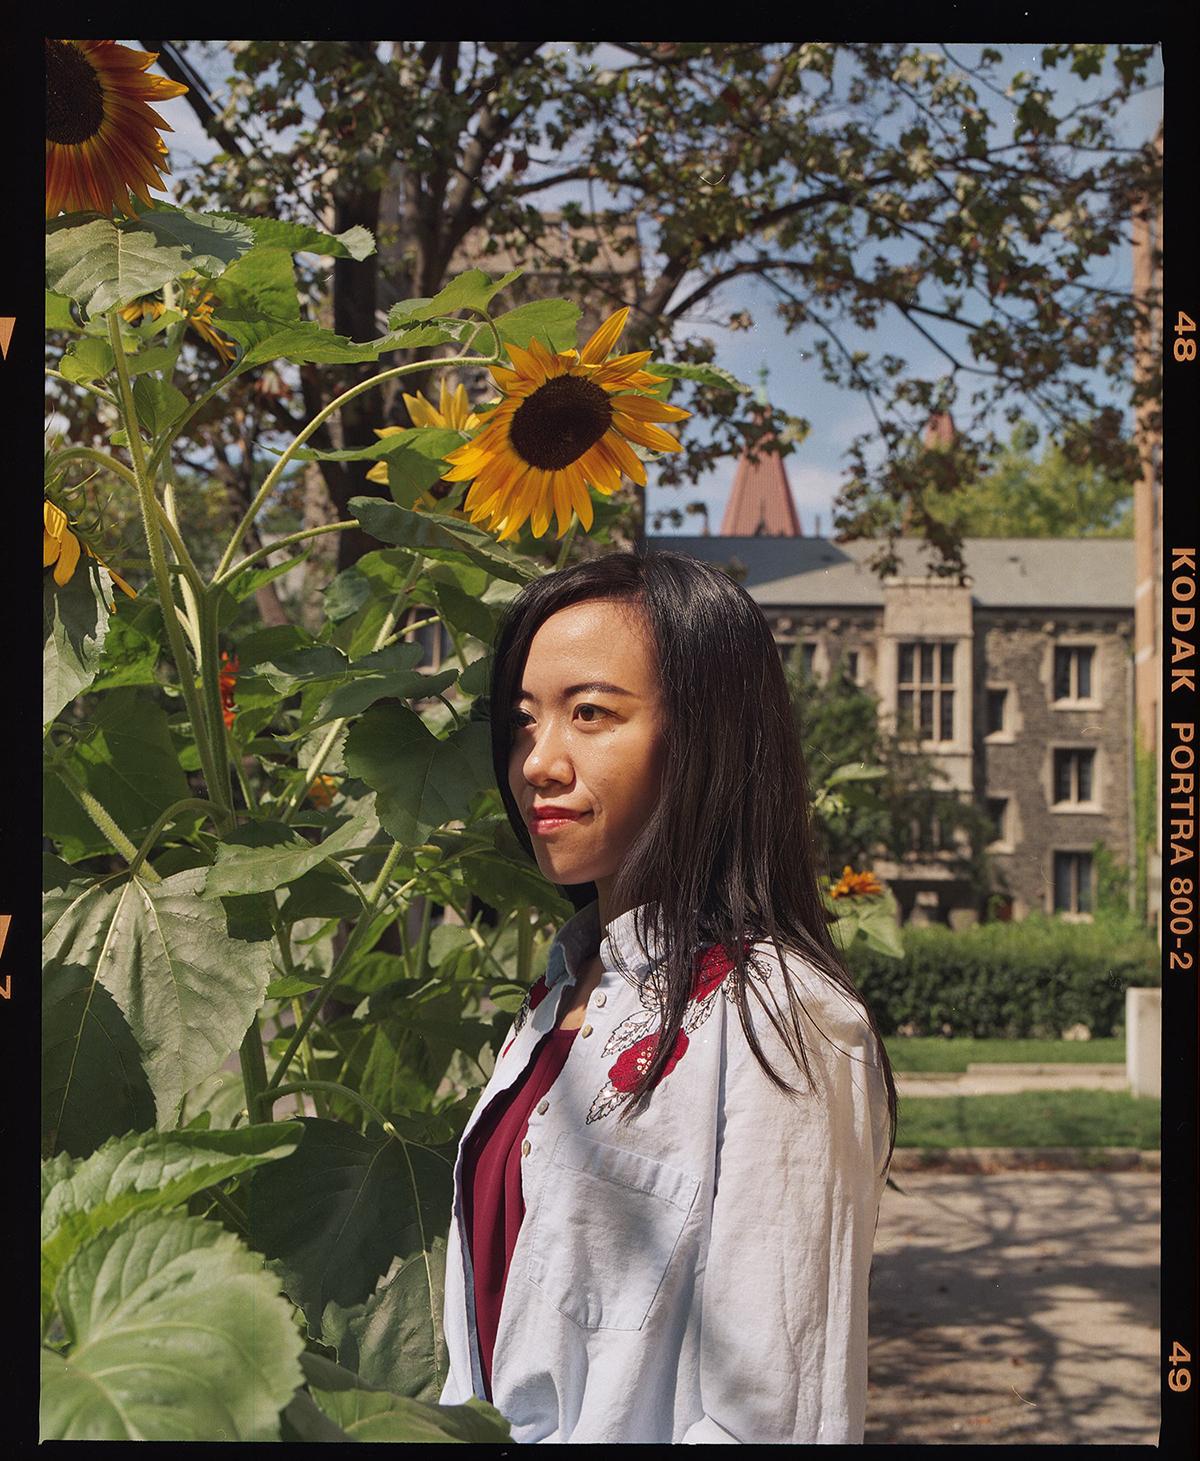 Jialiang Zhu standing next to a sunflower patch